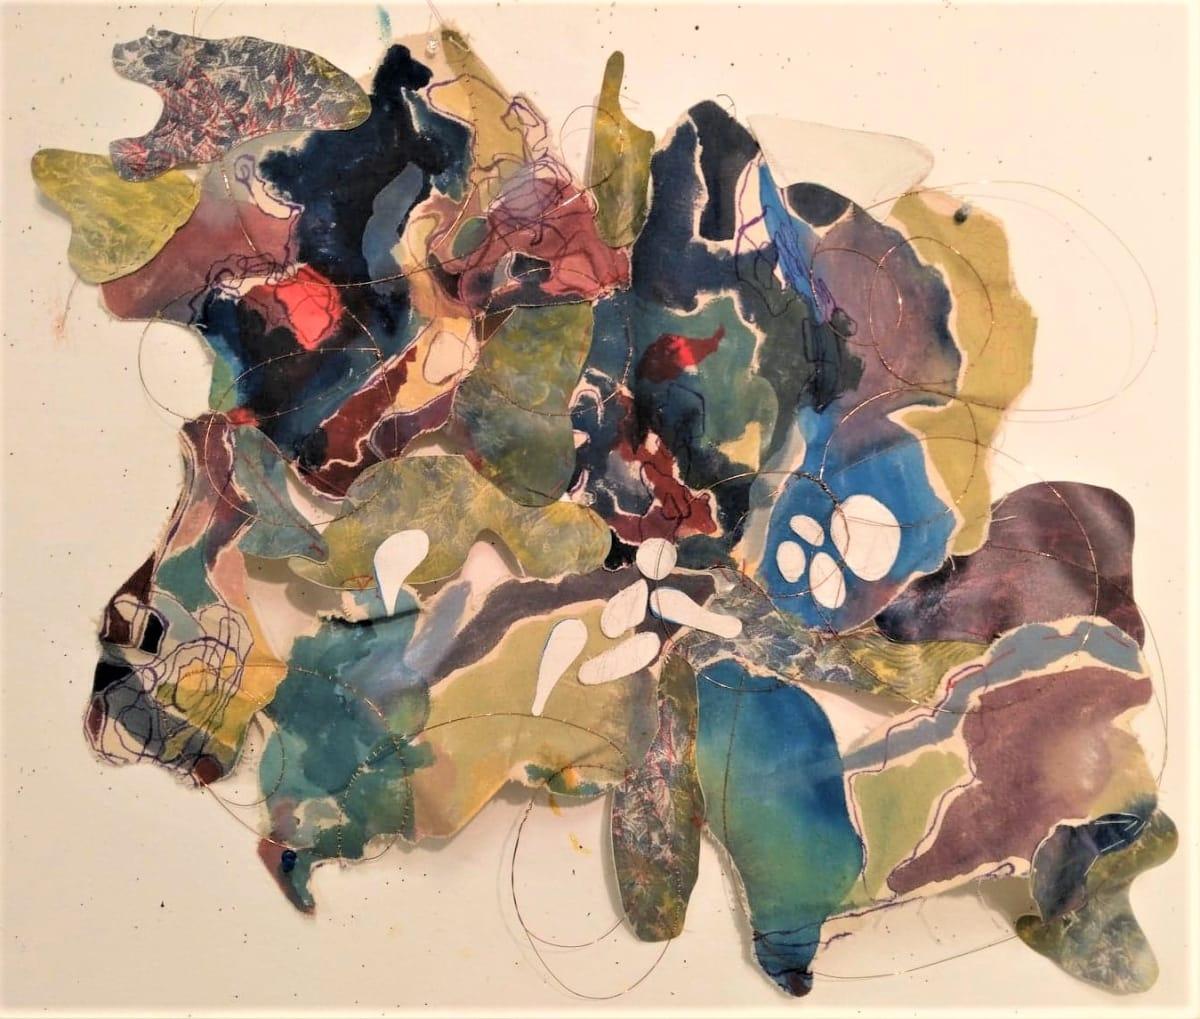 Untitled by Bethany LeJeune